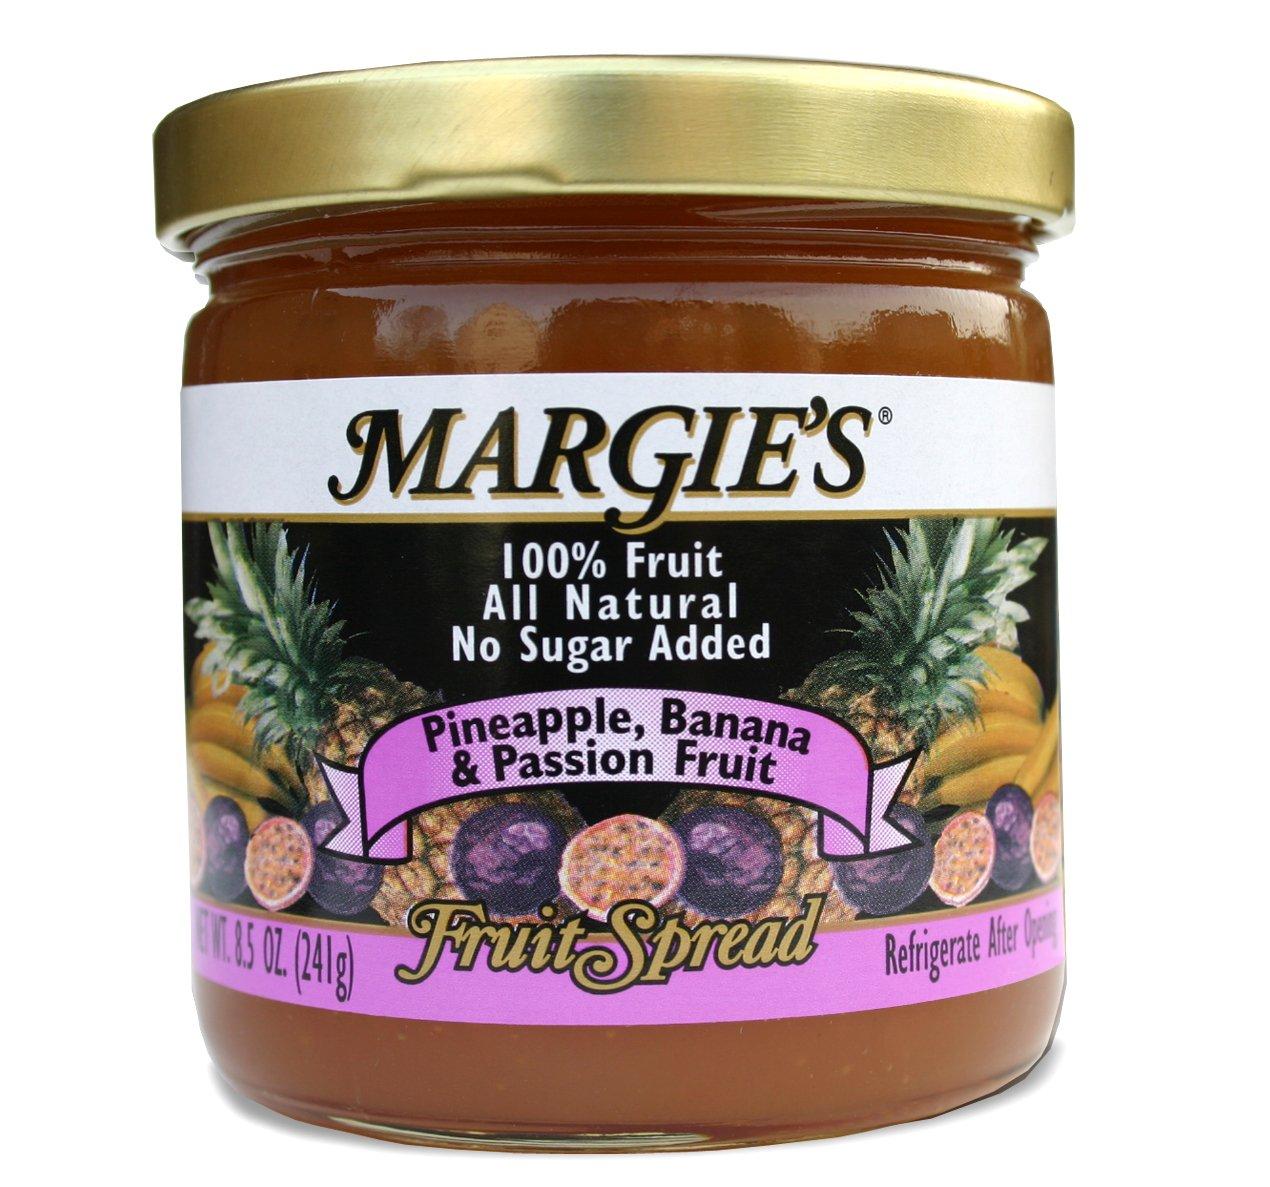 Margie's Pineapple-Banana-Passion Fruit Spread